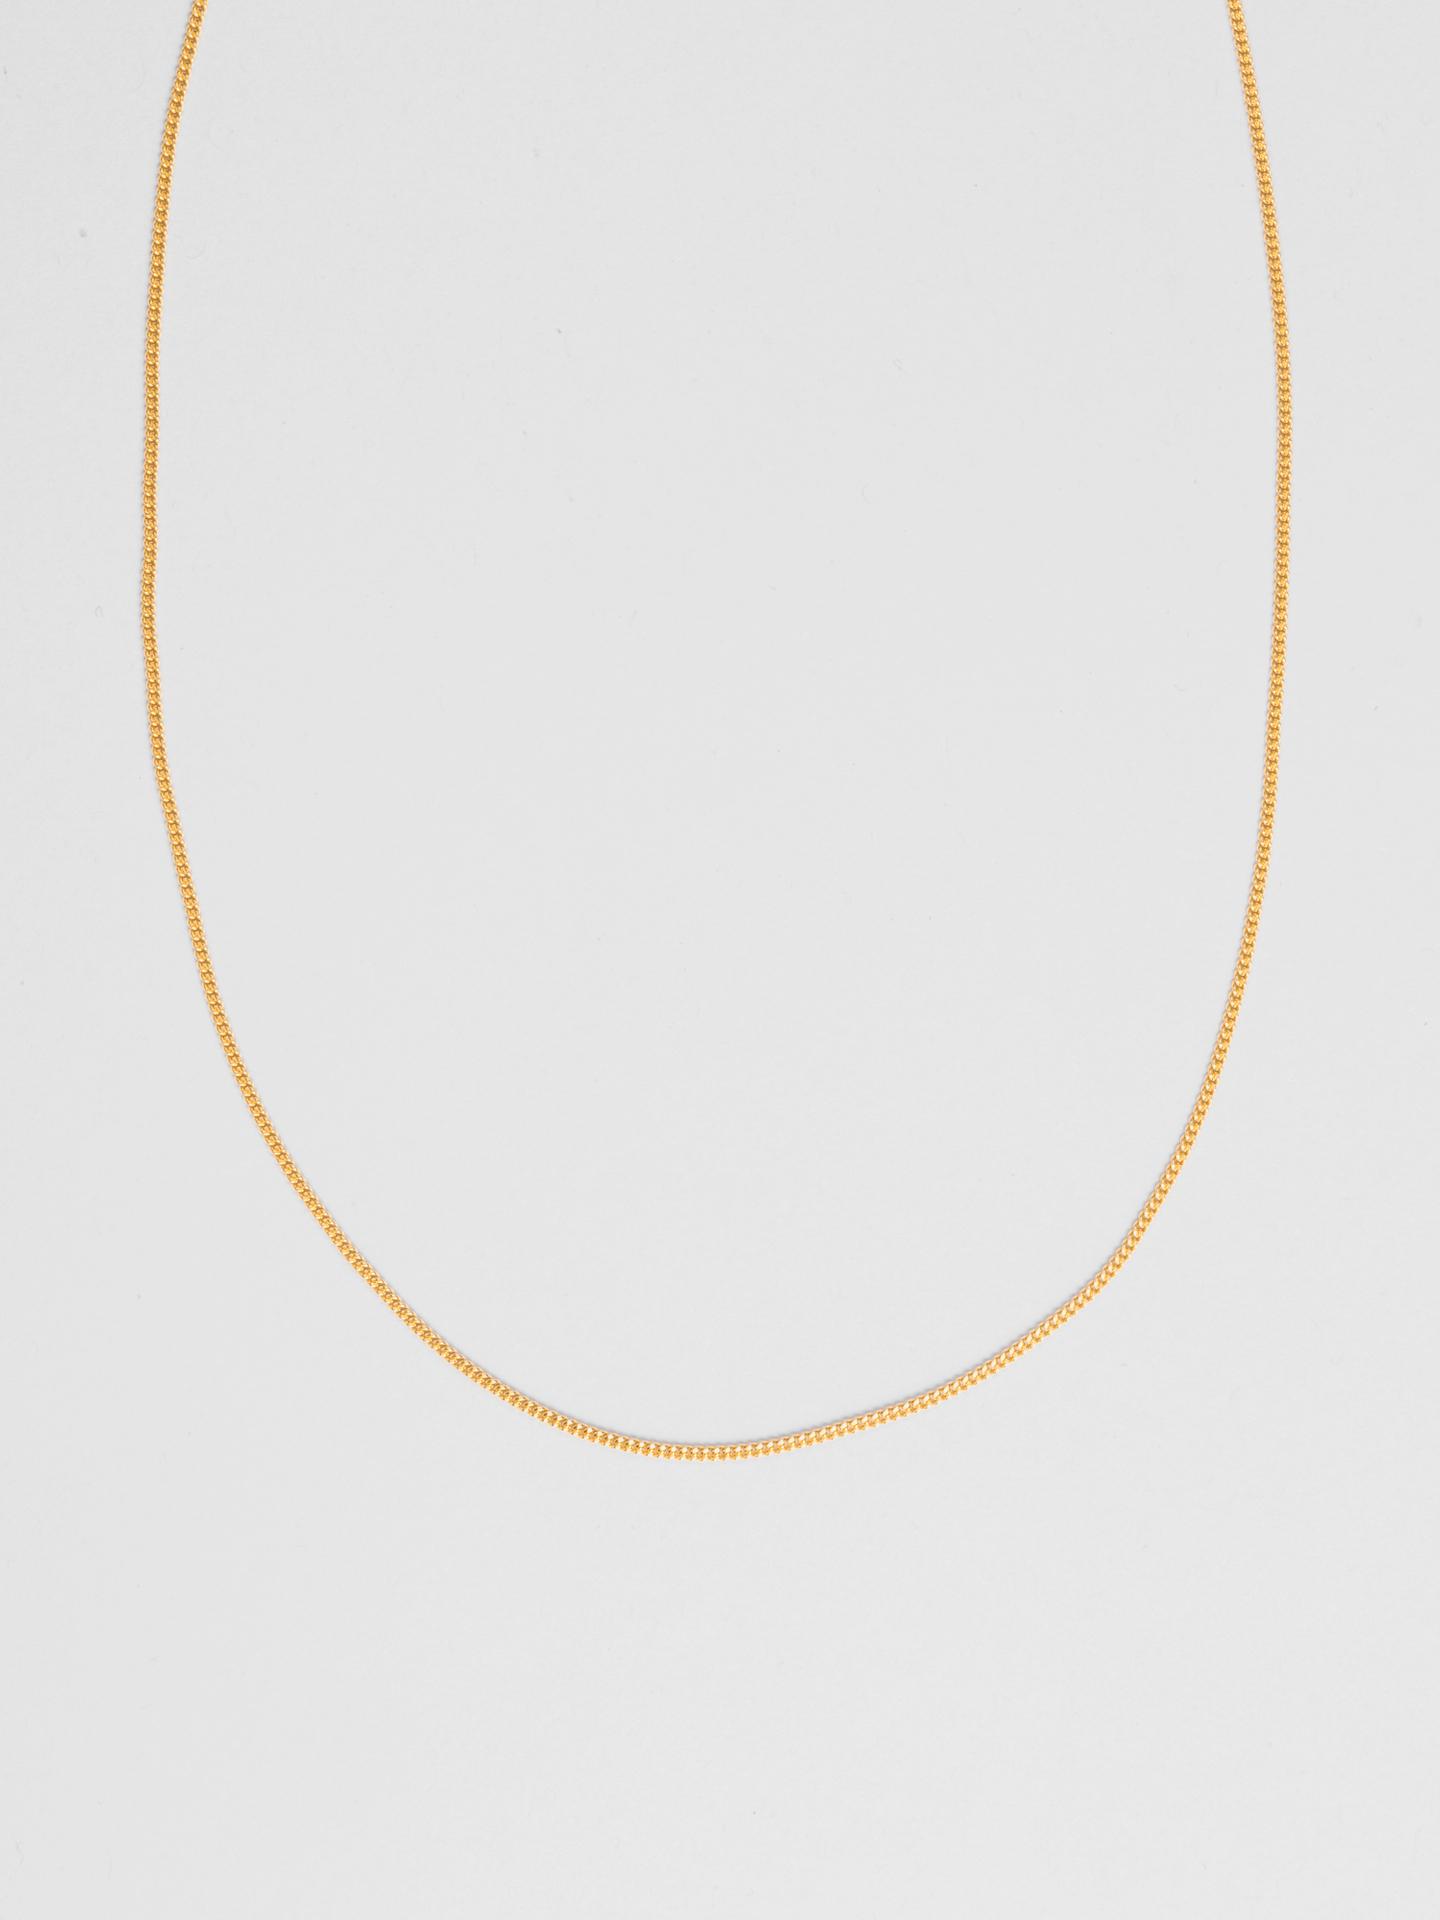 Solo Chain Necklace